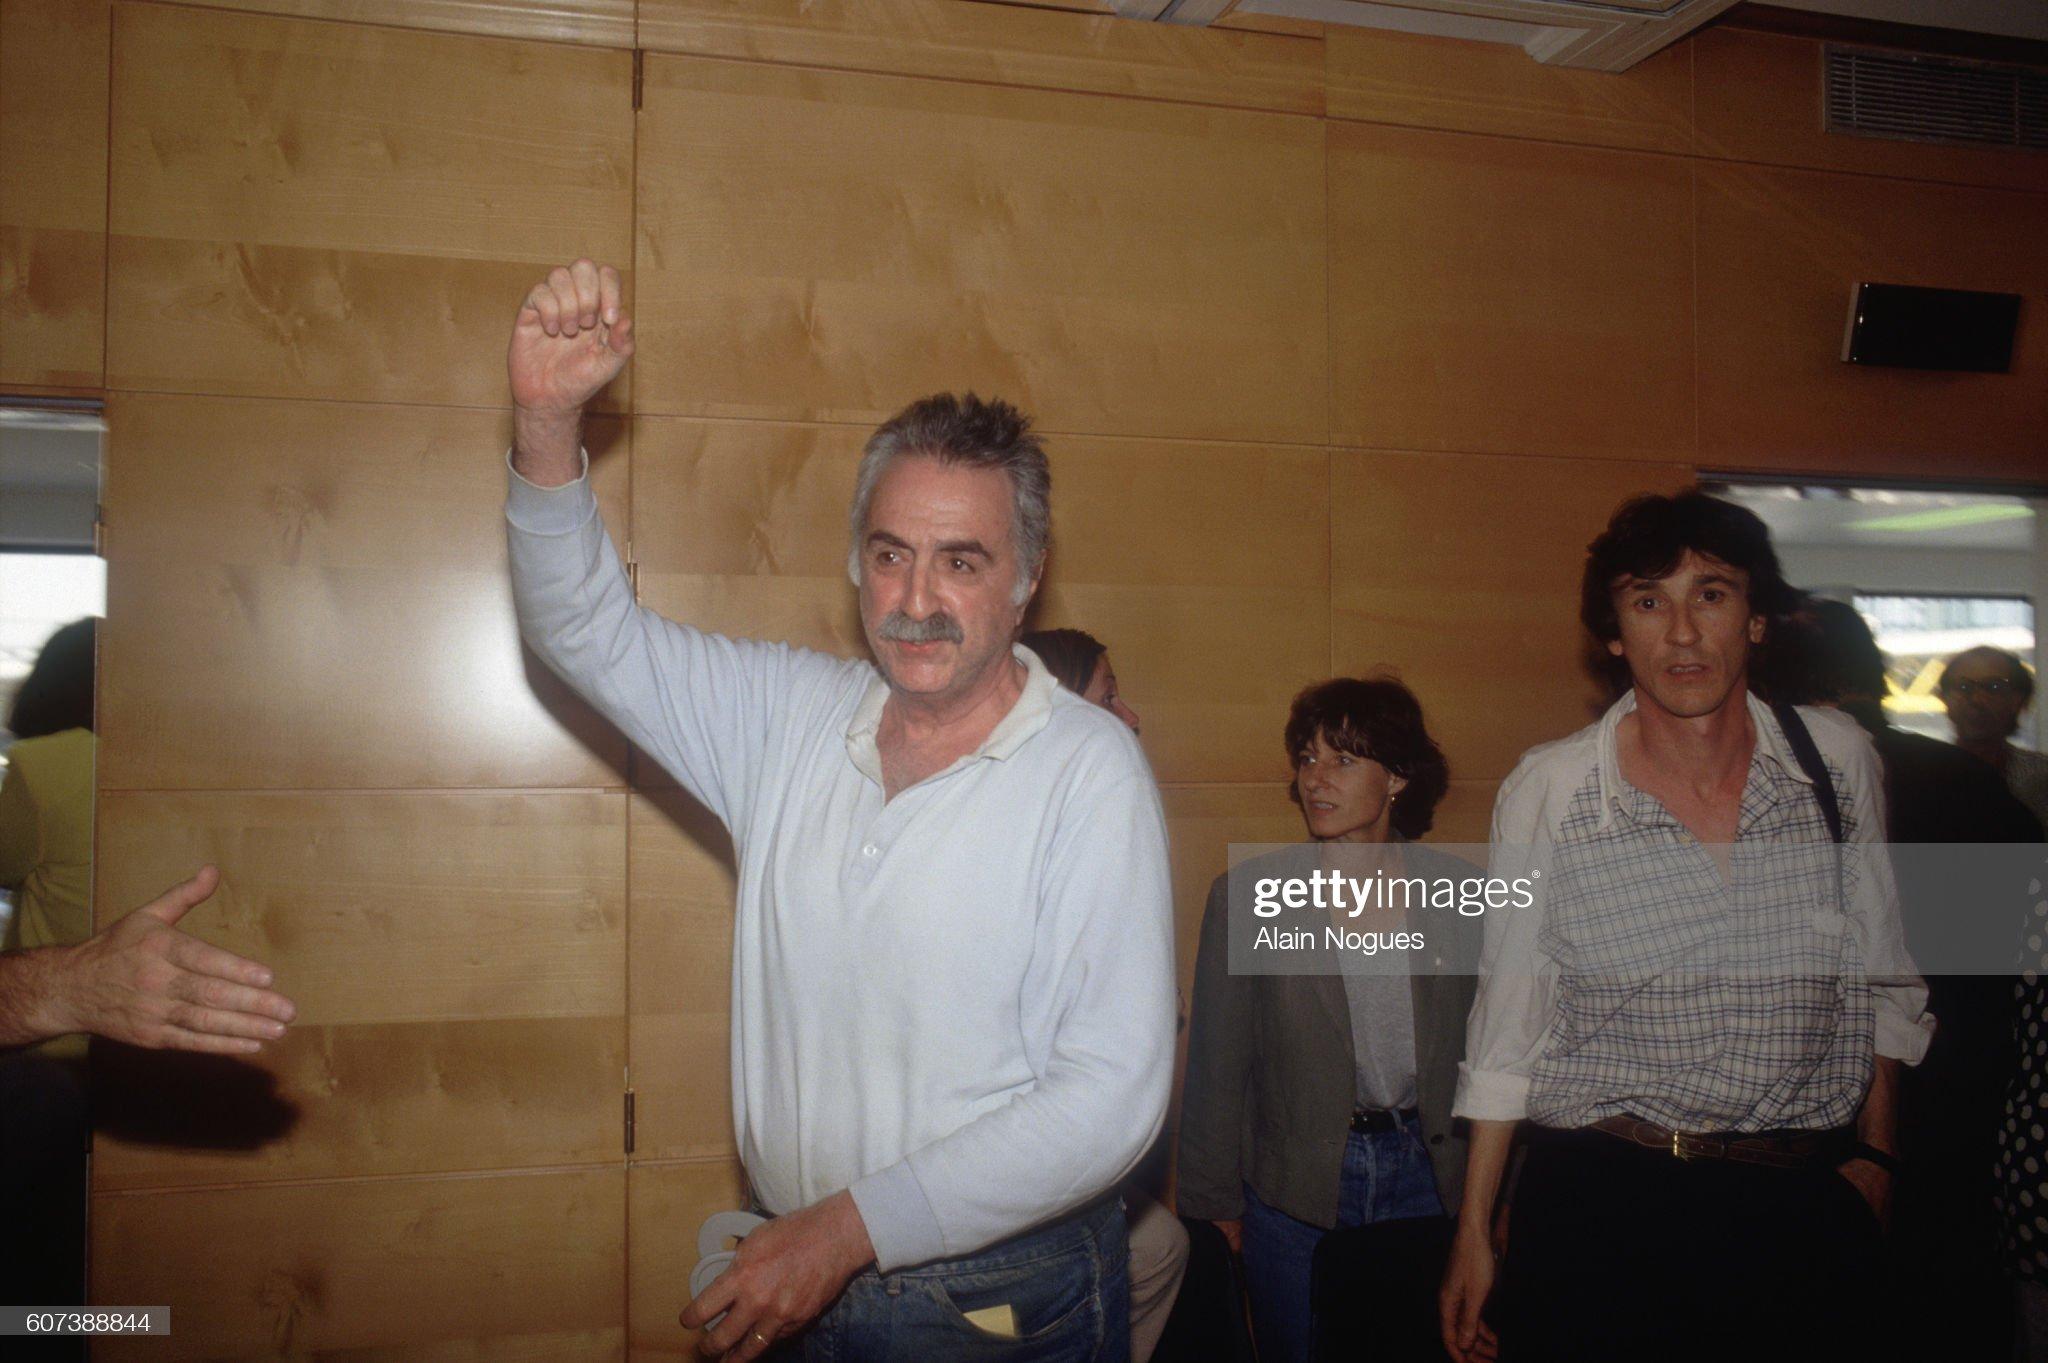 Political Prisoner Abraham Serfati Arrives at Orly Airport : News Photo